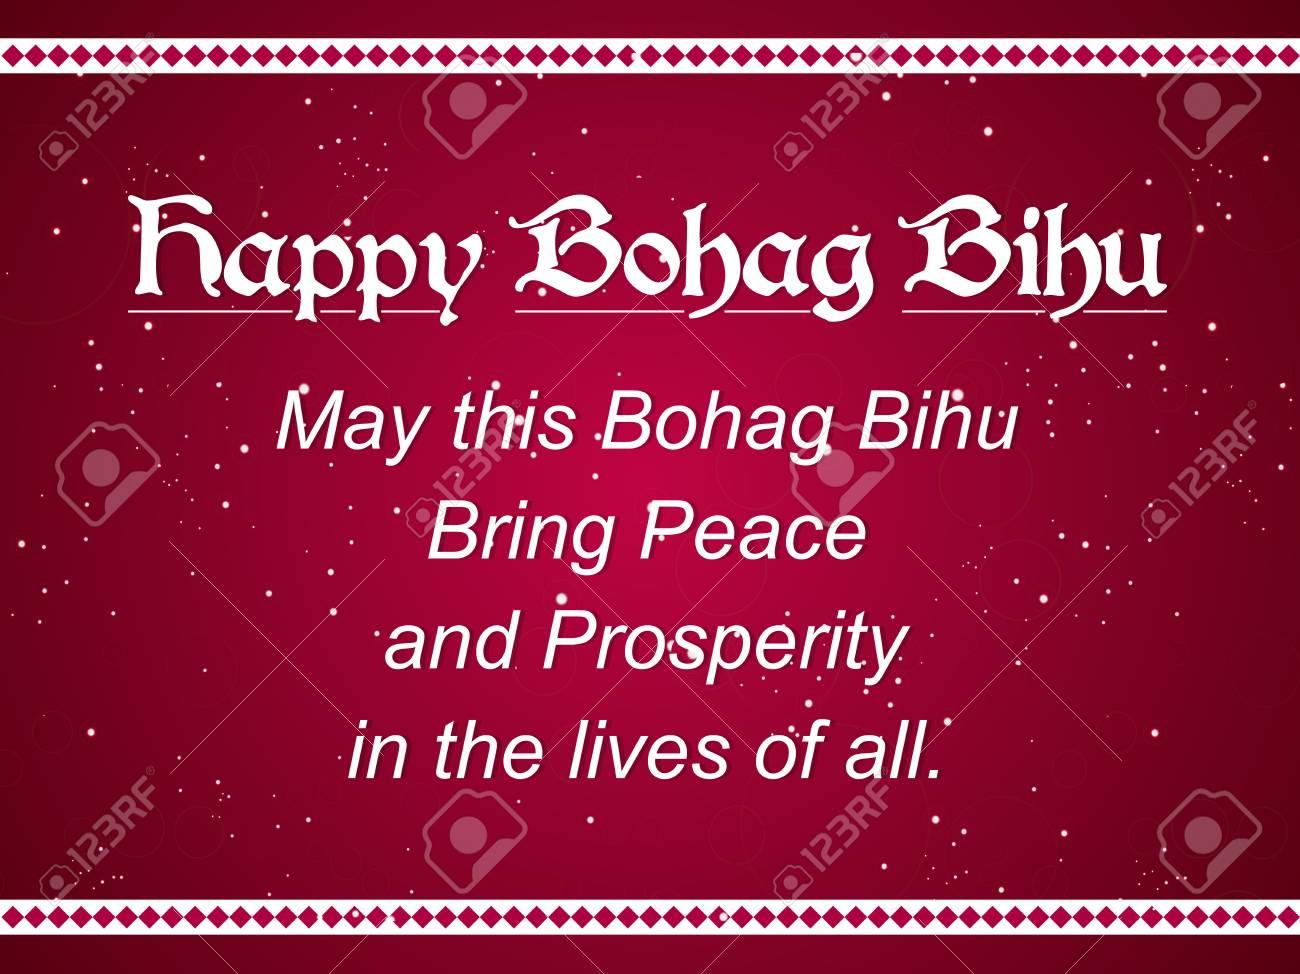 Nice And Beautiful Greetings For Happy Bohag Bihu With Creative